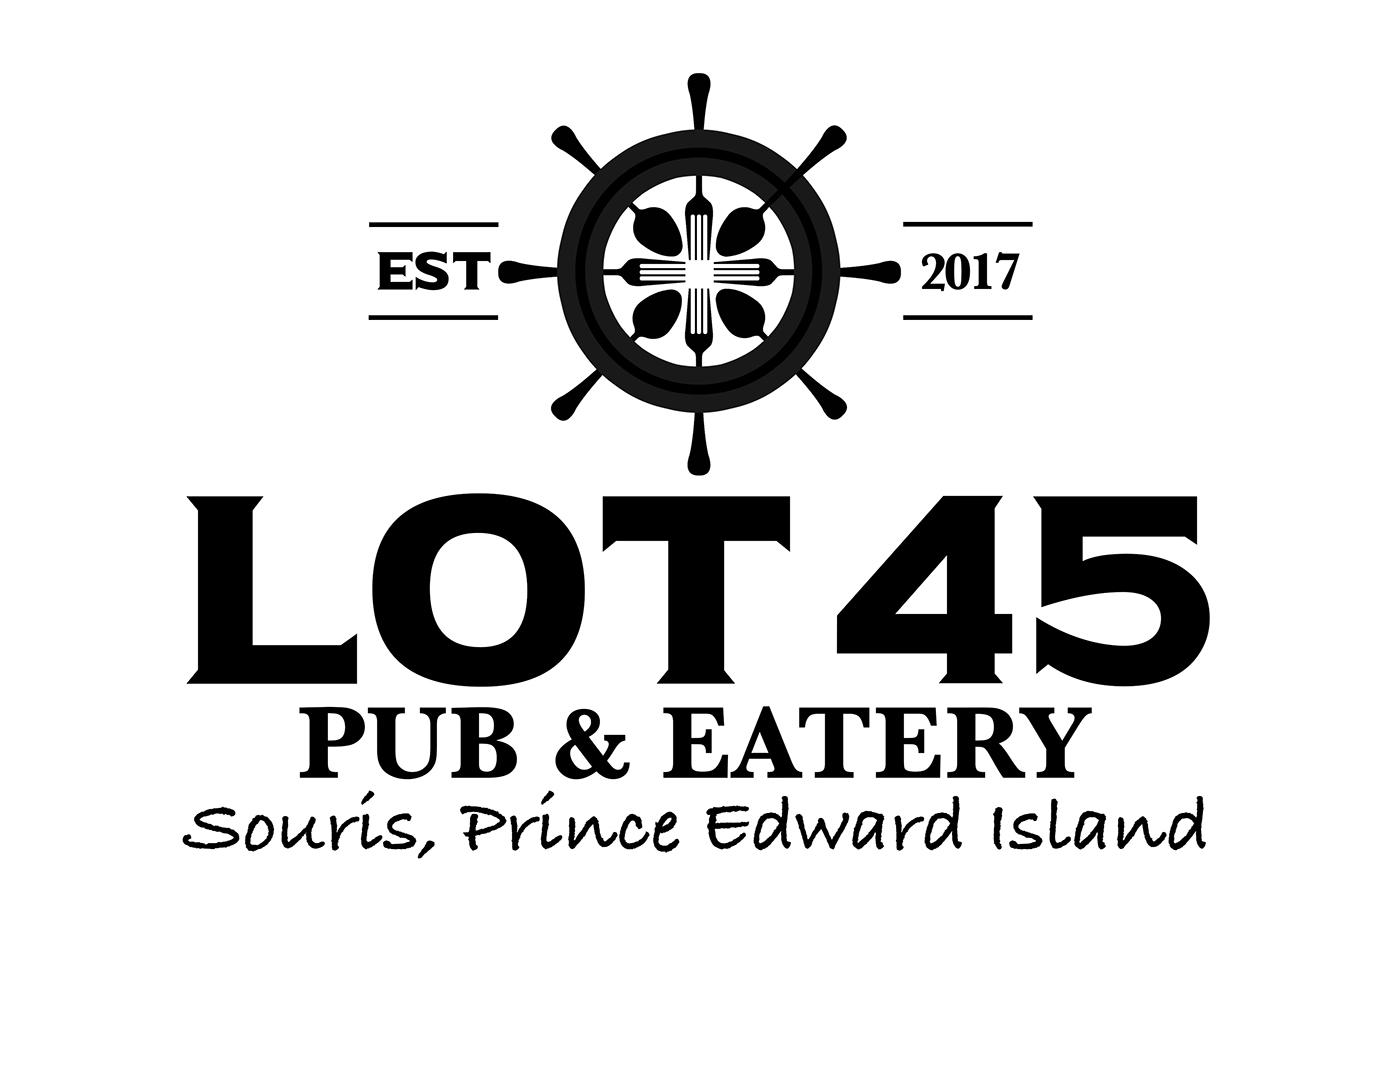 Pub logo restaurant Island Ocean ship wheel nautical knifes forks